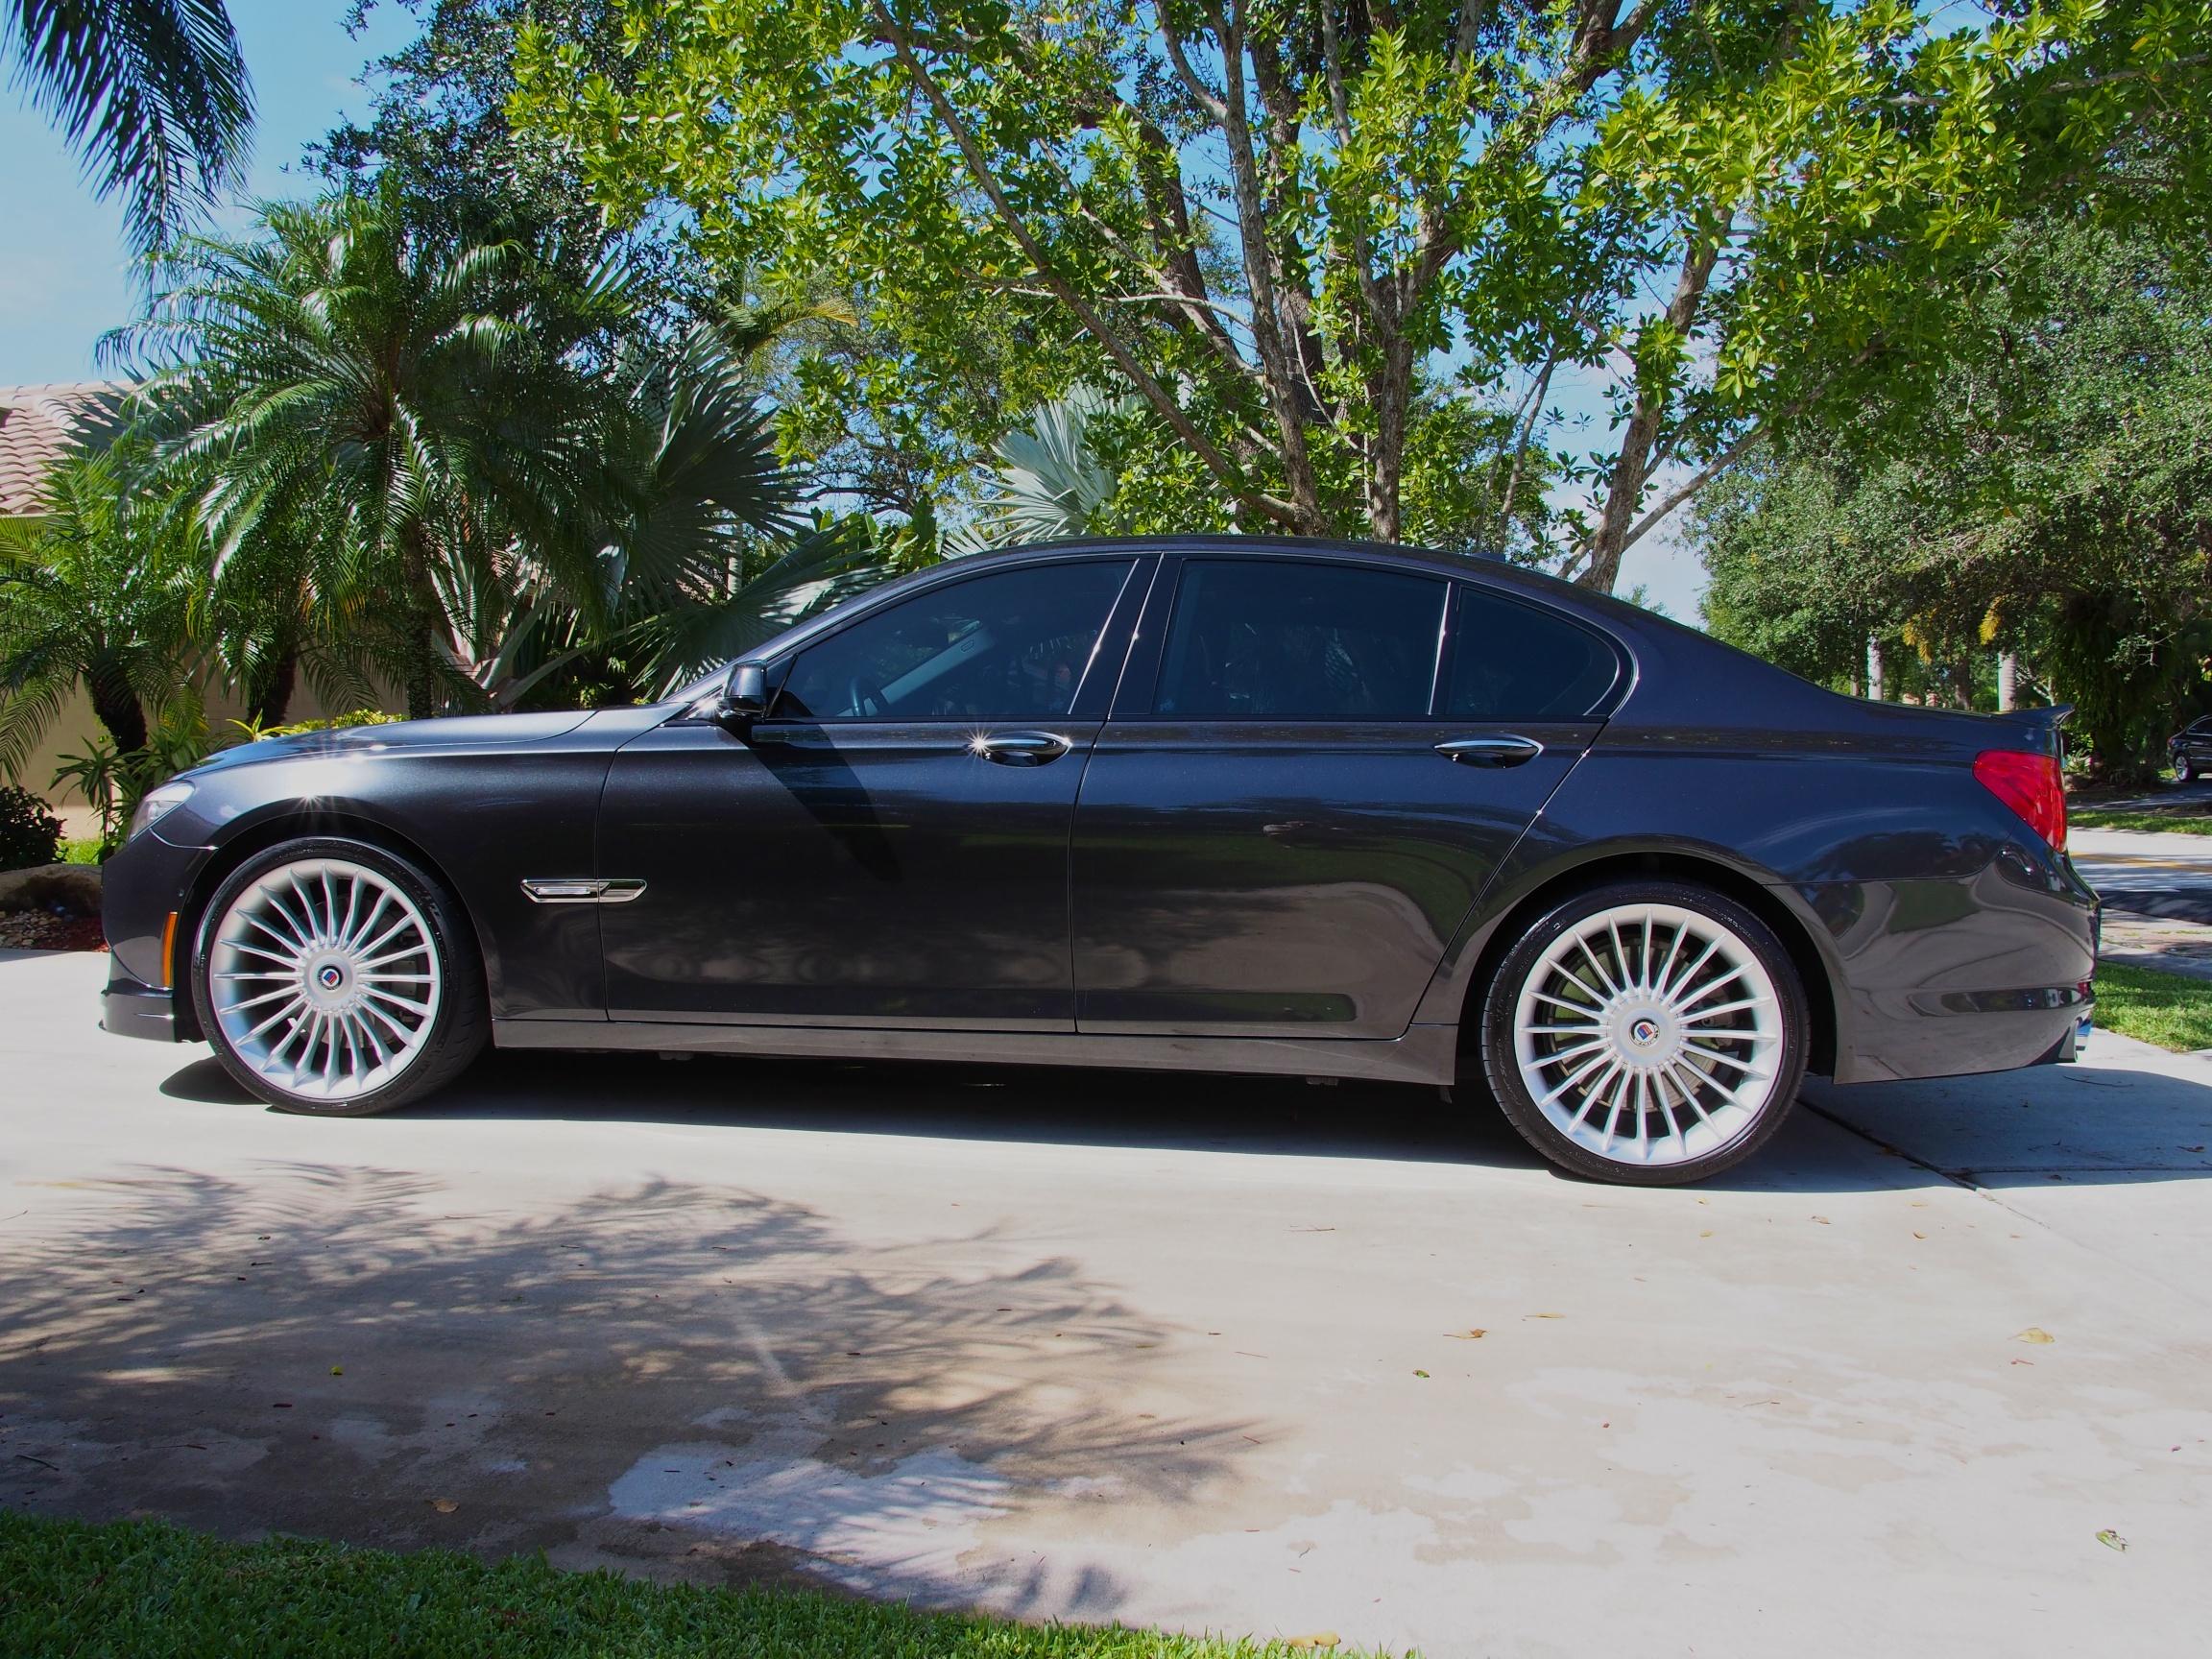 ALPINA For Sale 2011 Alpina B7 for sale, 24,500 mi $91,500 - BMW M5 ...